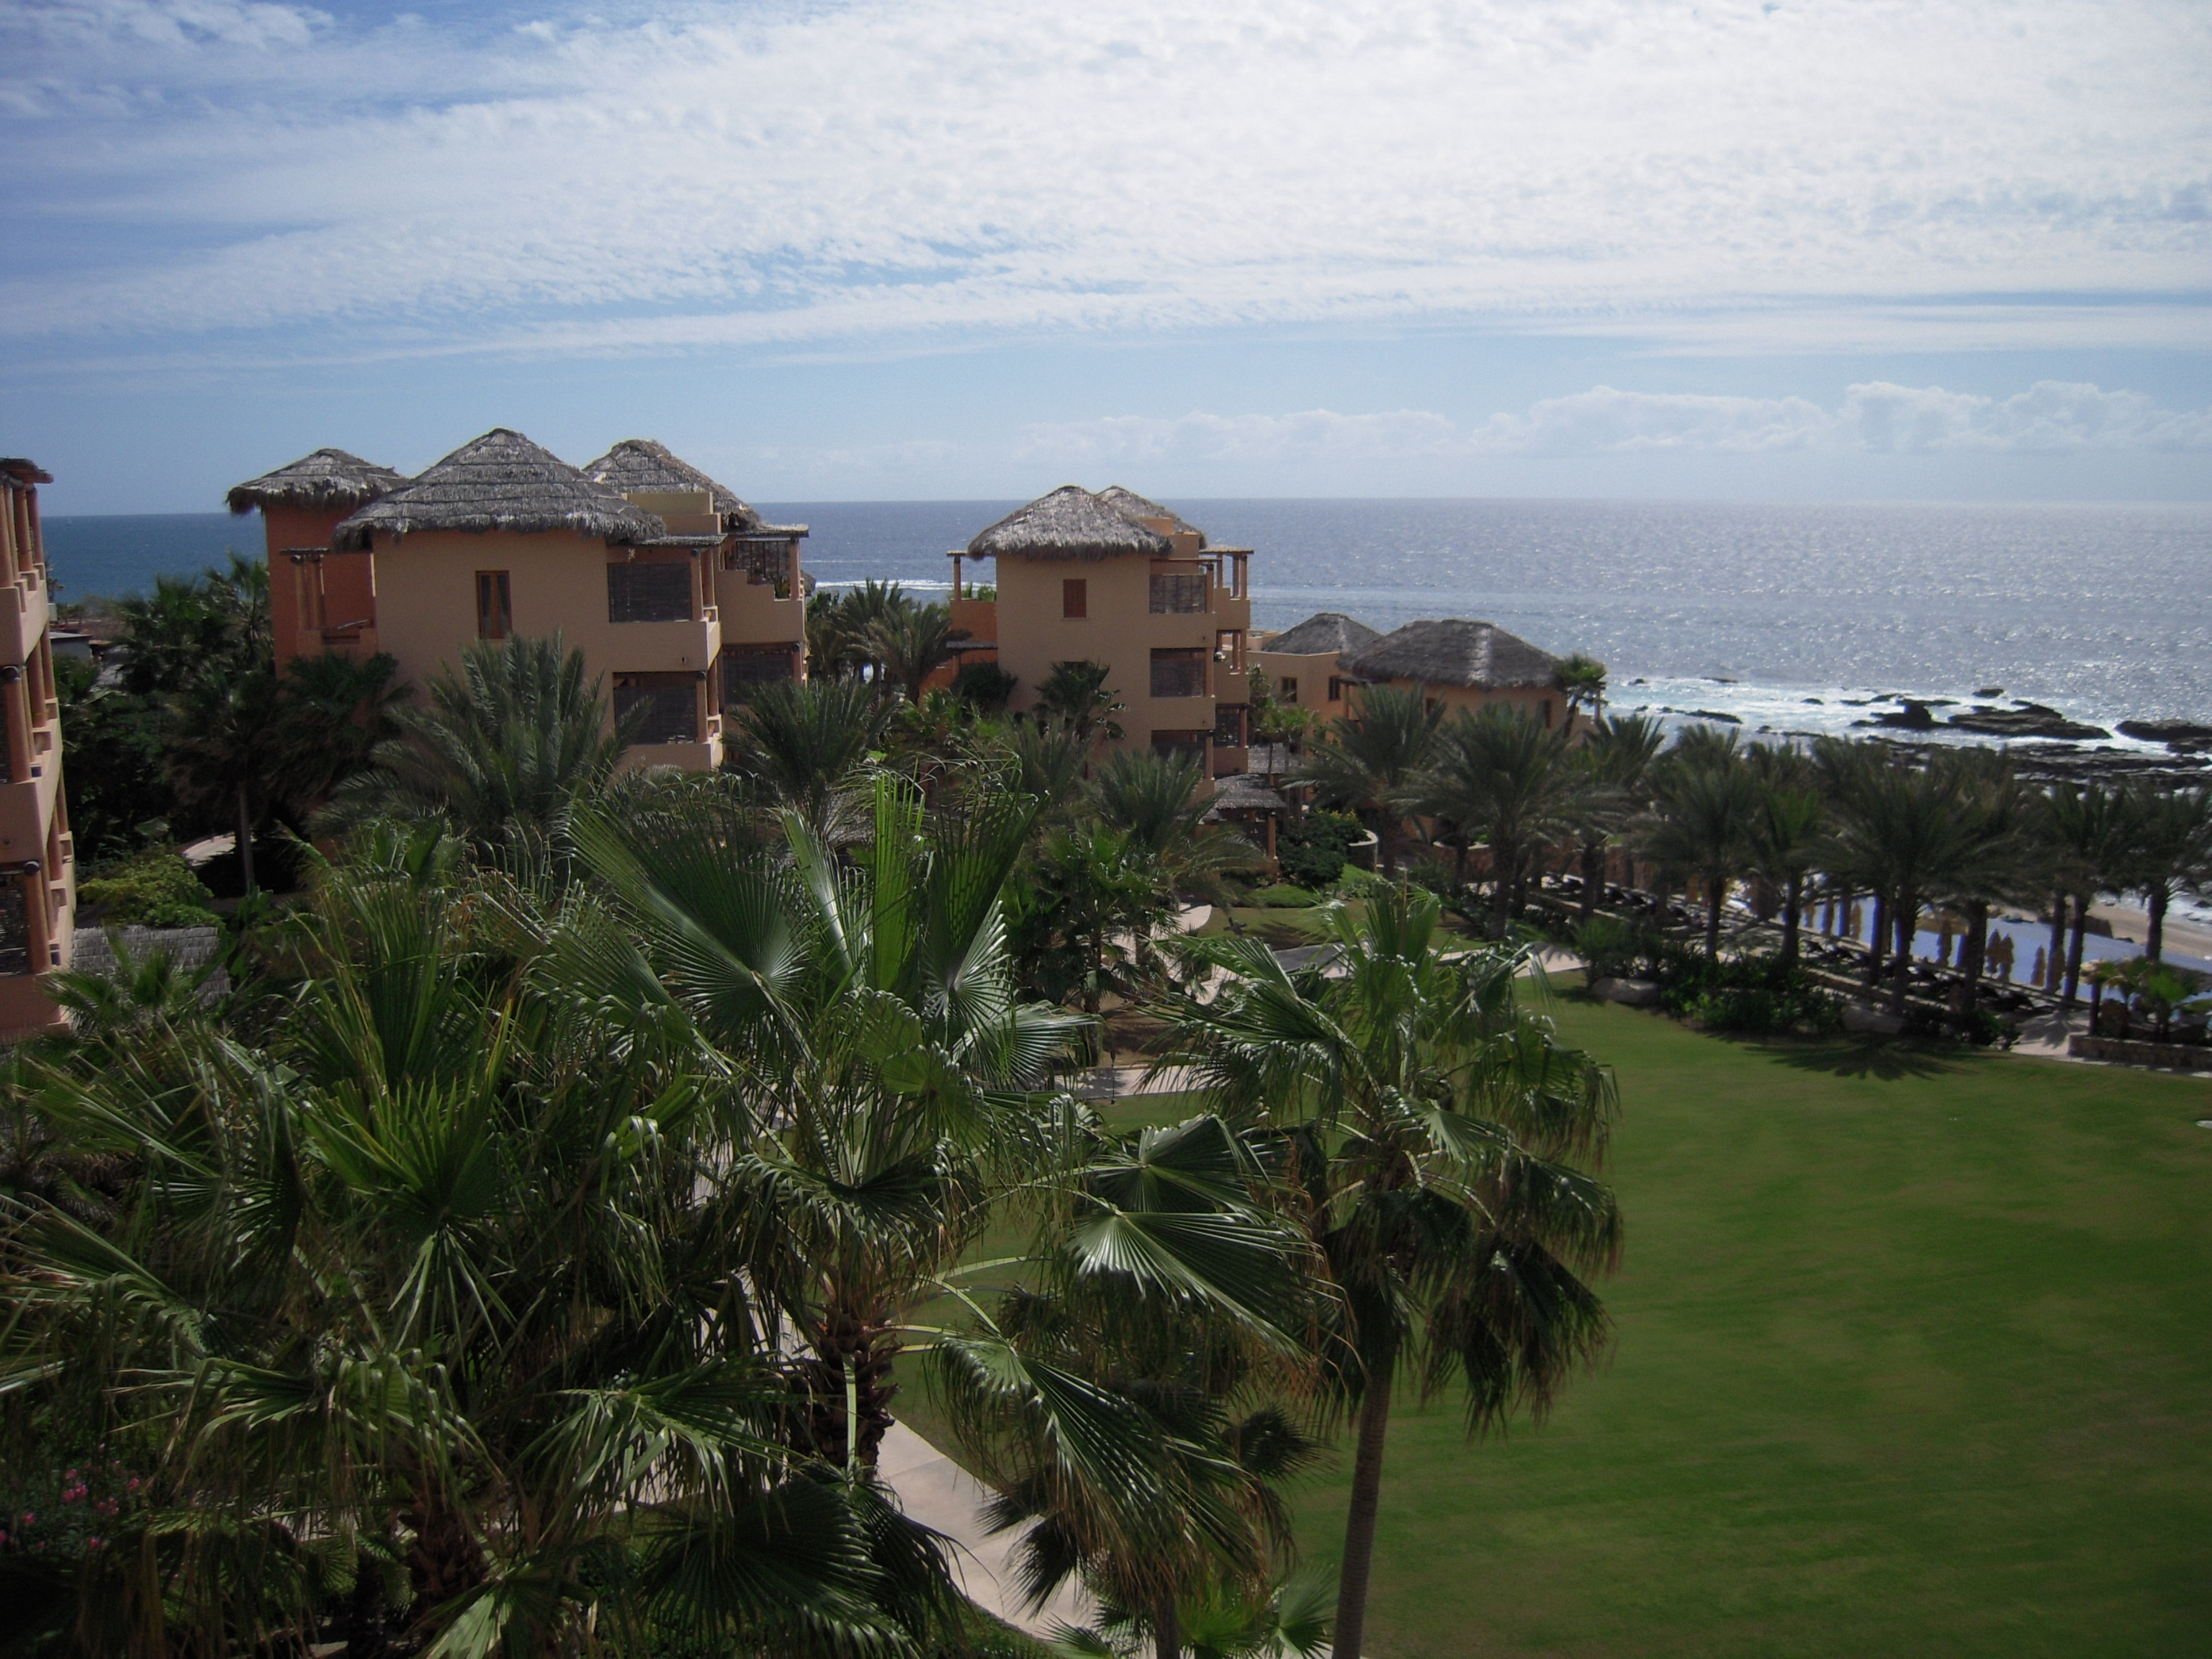 Ezperanza Resort - Cabo San Lucas